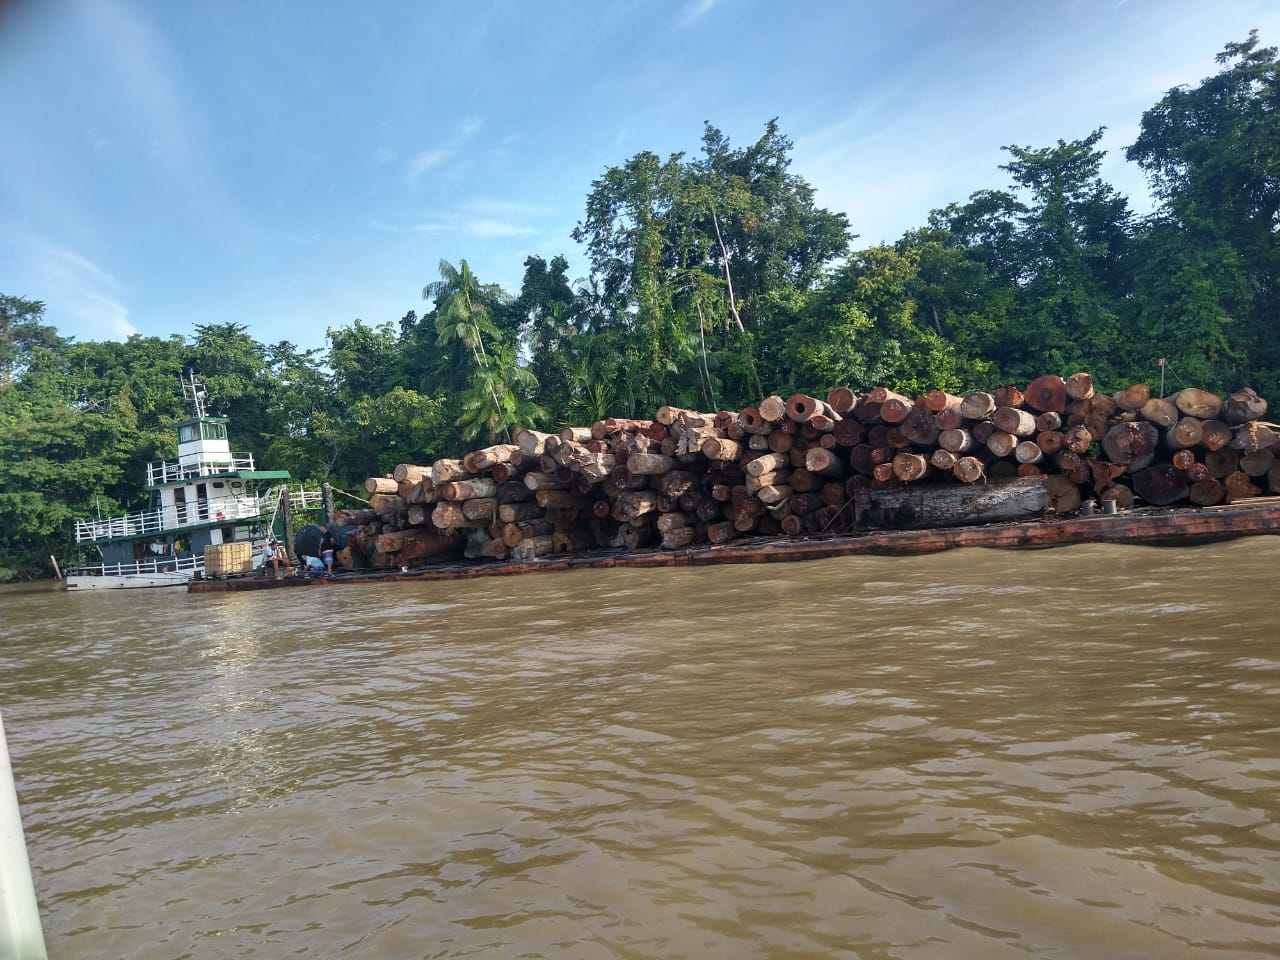 300m3 of illegal timber seized near Igarapé-Miri